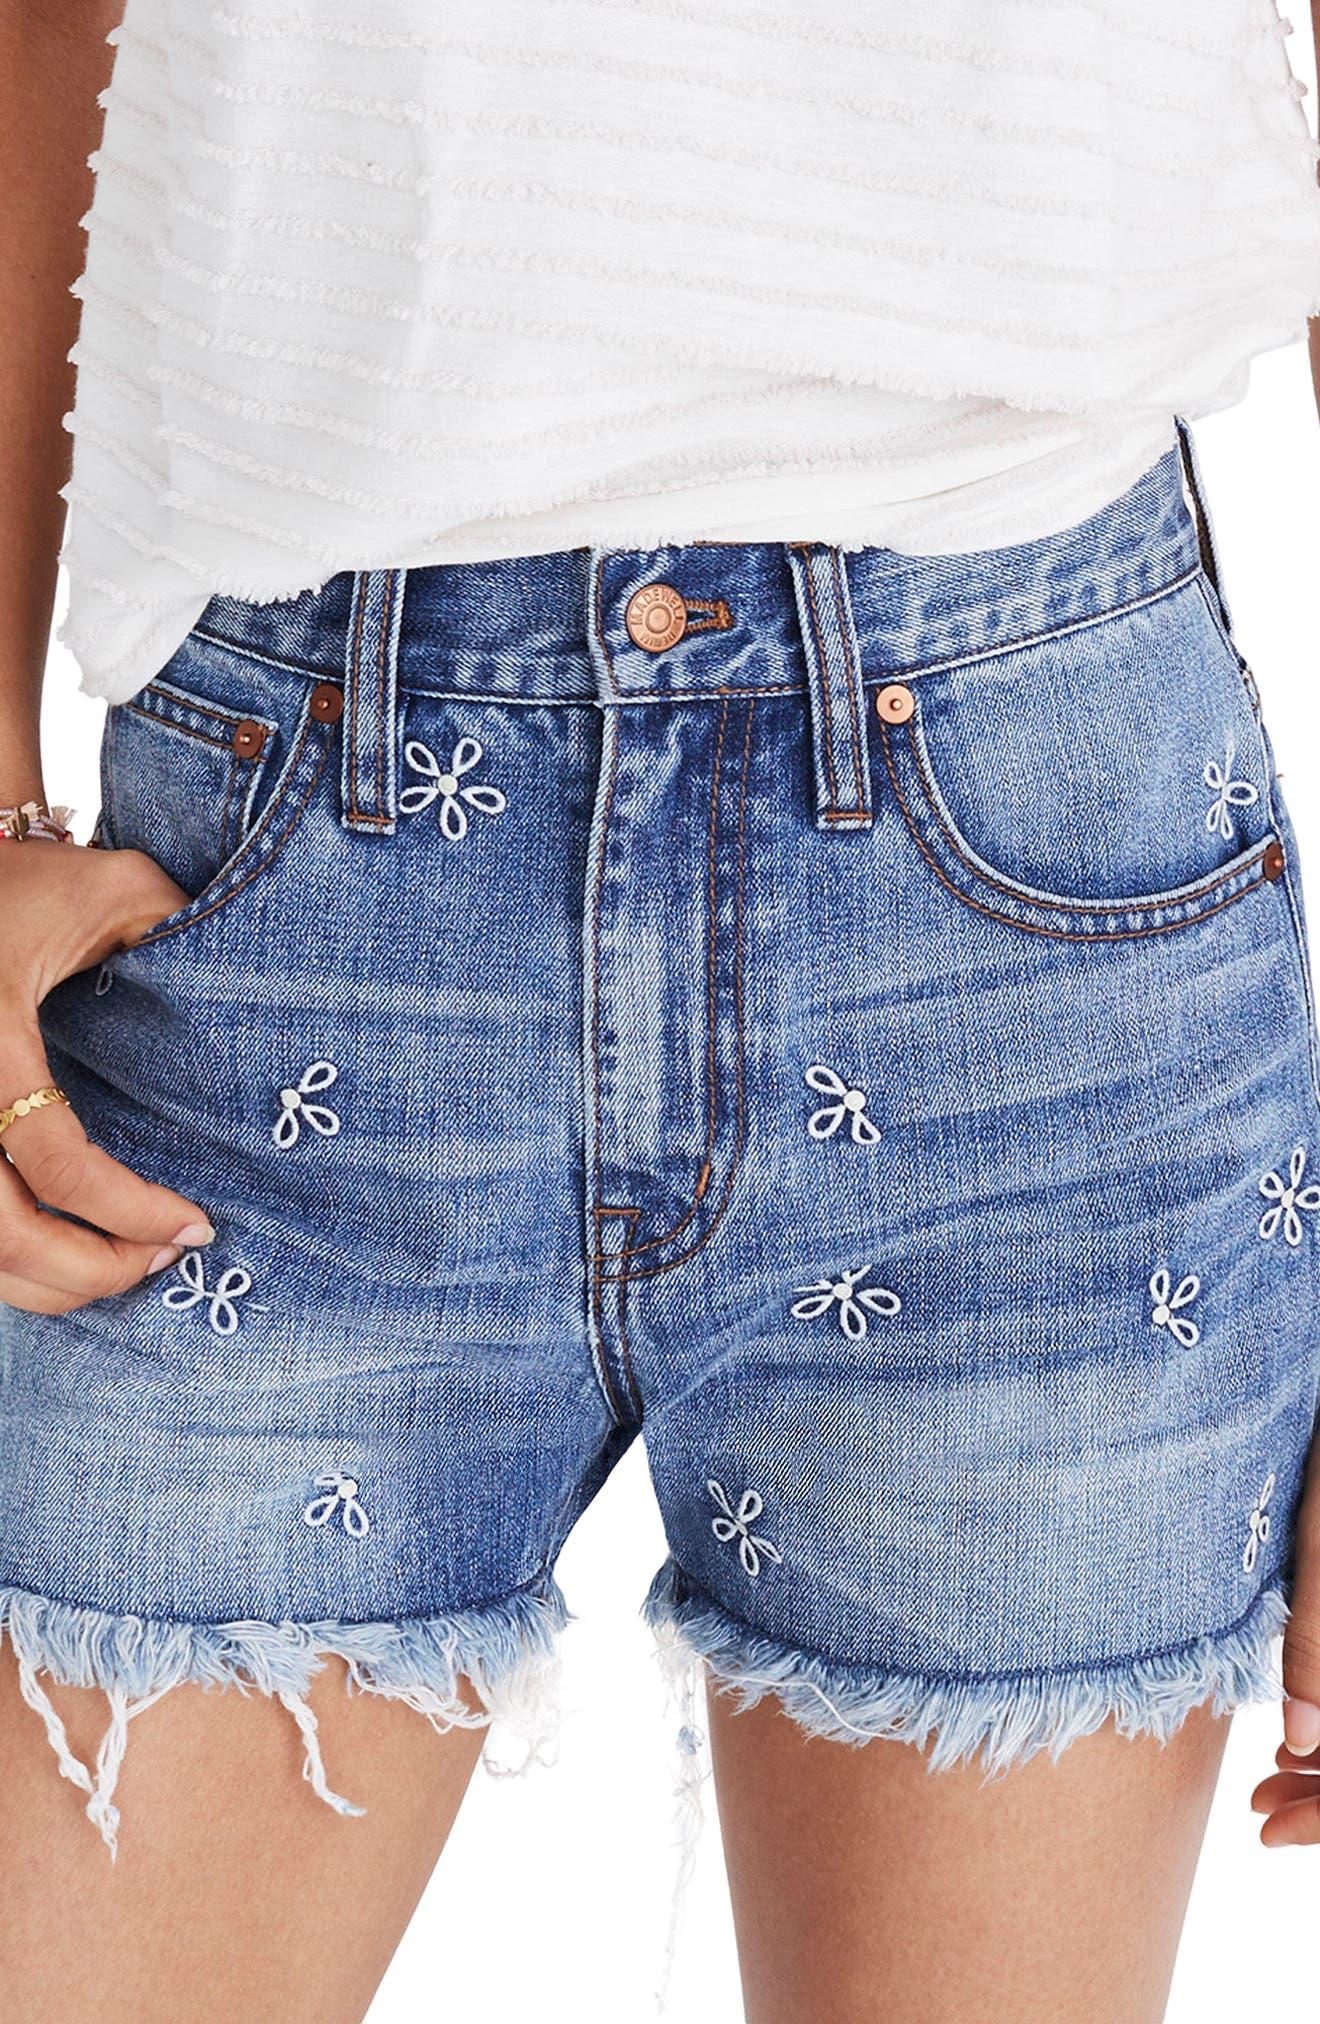 Madewell Perfect Daisy Embroidered High Waist Denim Shorts (Aberdeen Wash)